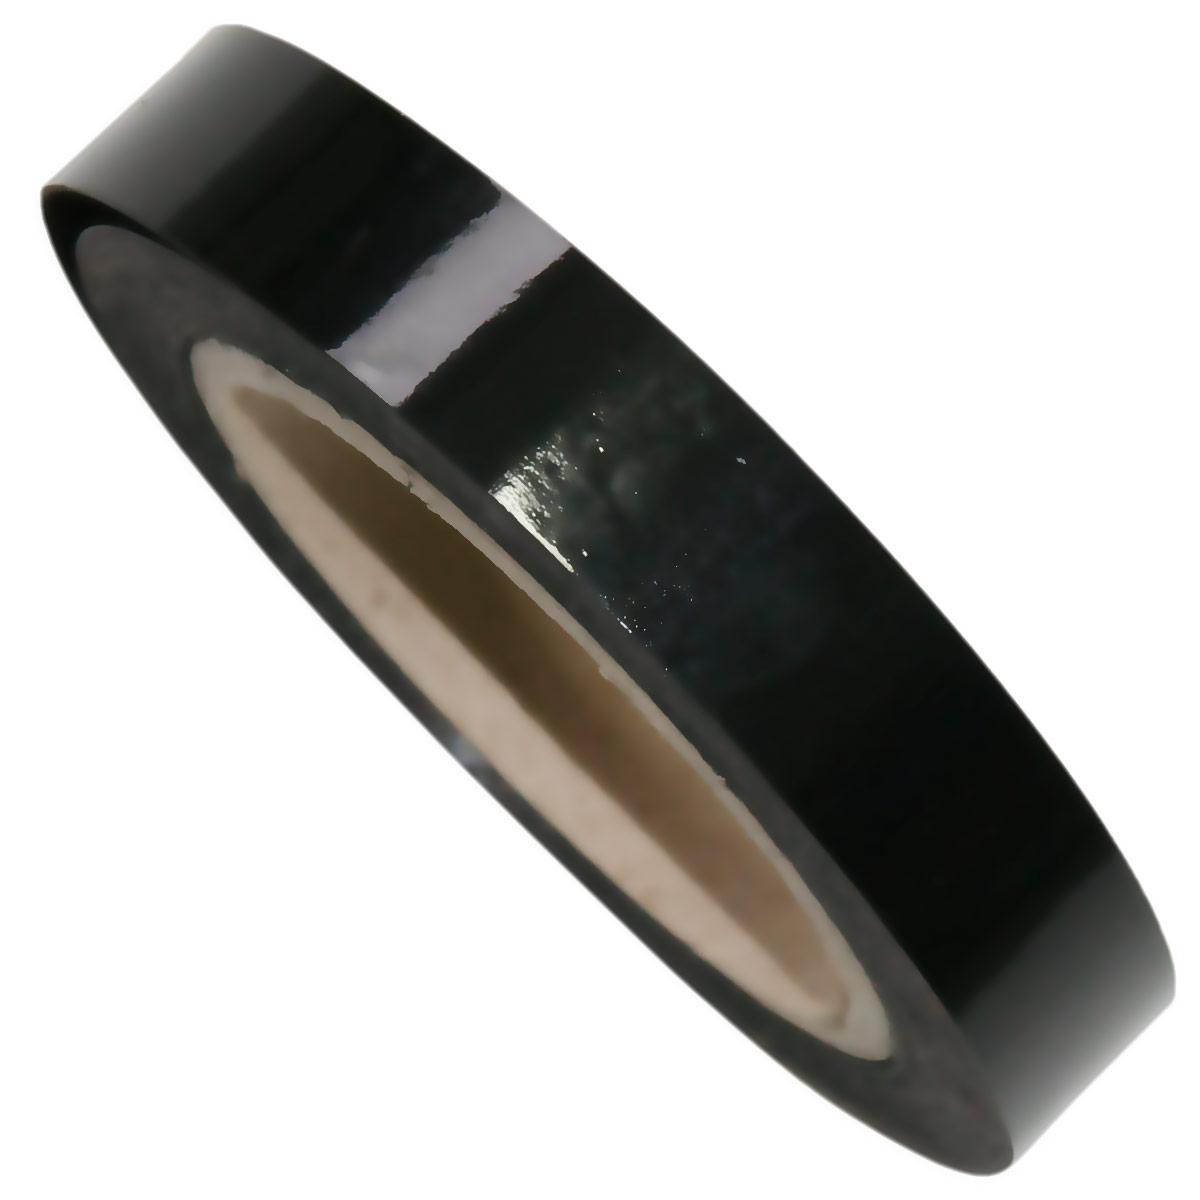 Pasek magnetyczny czarny